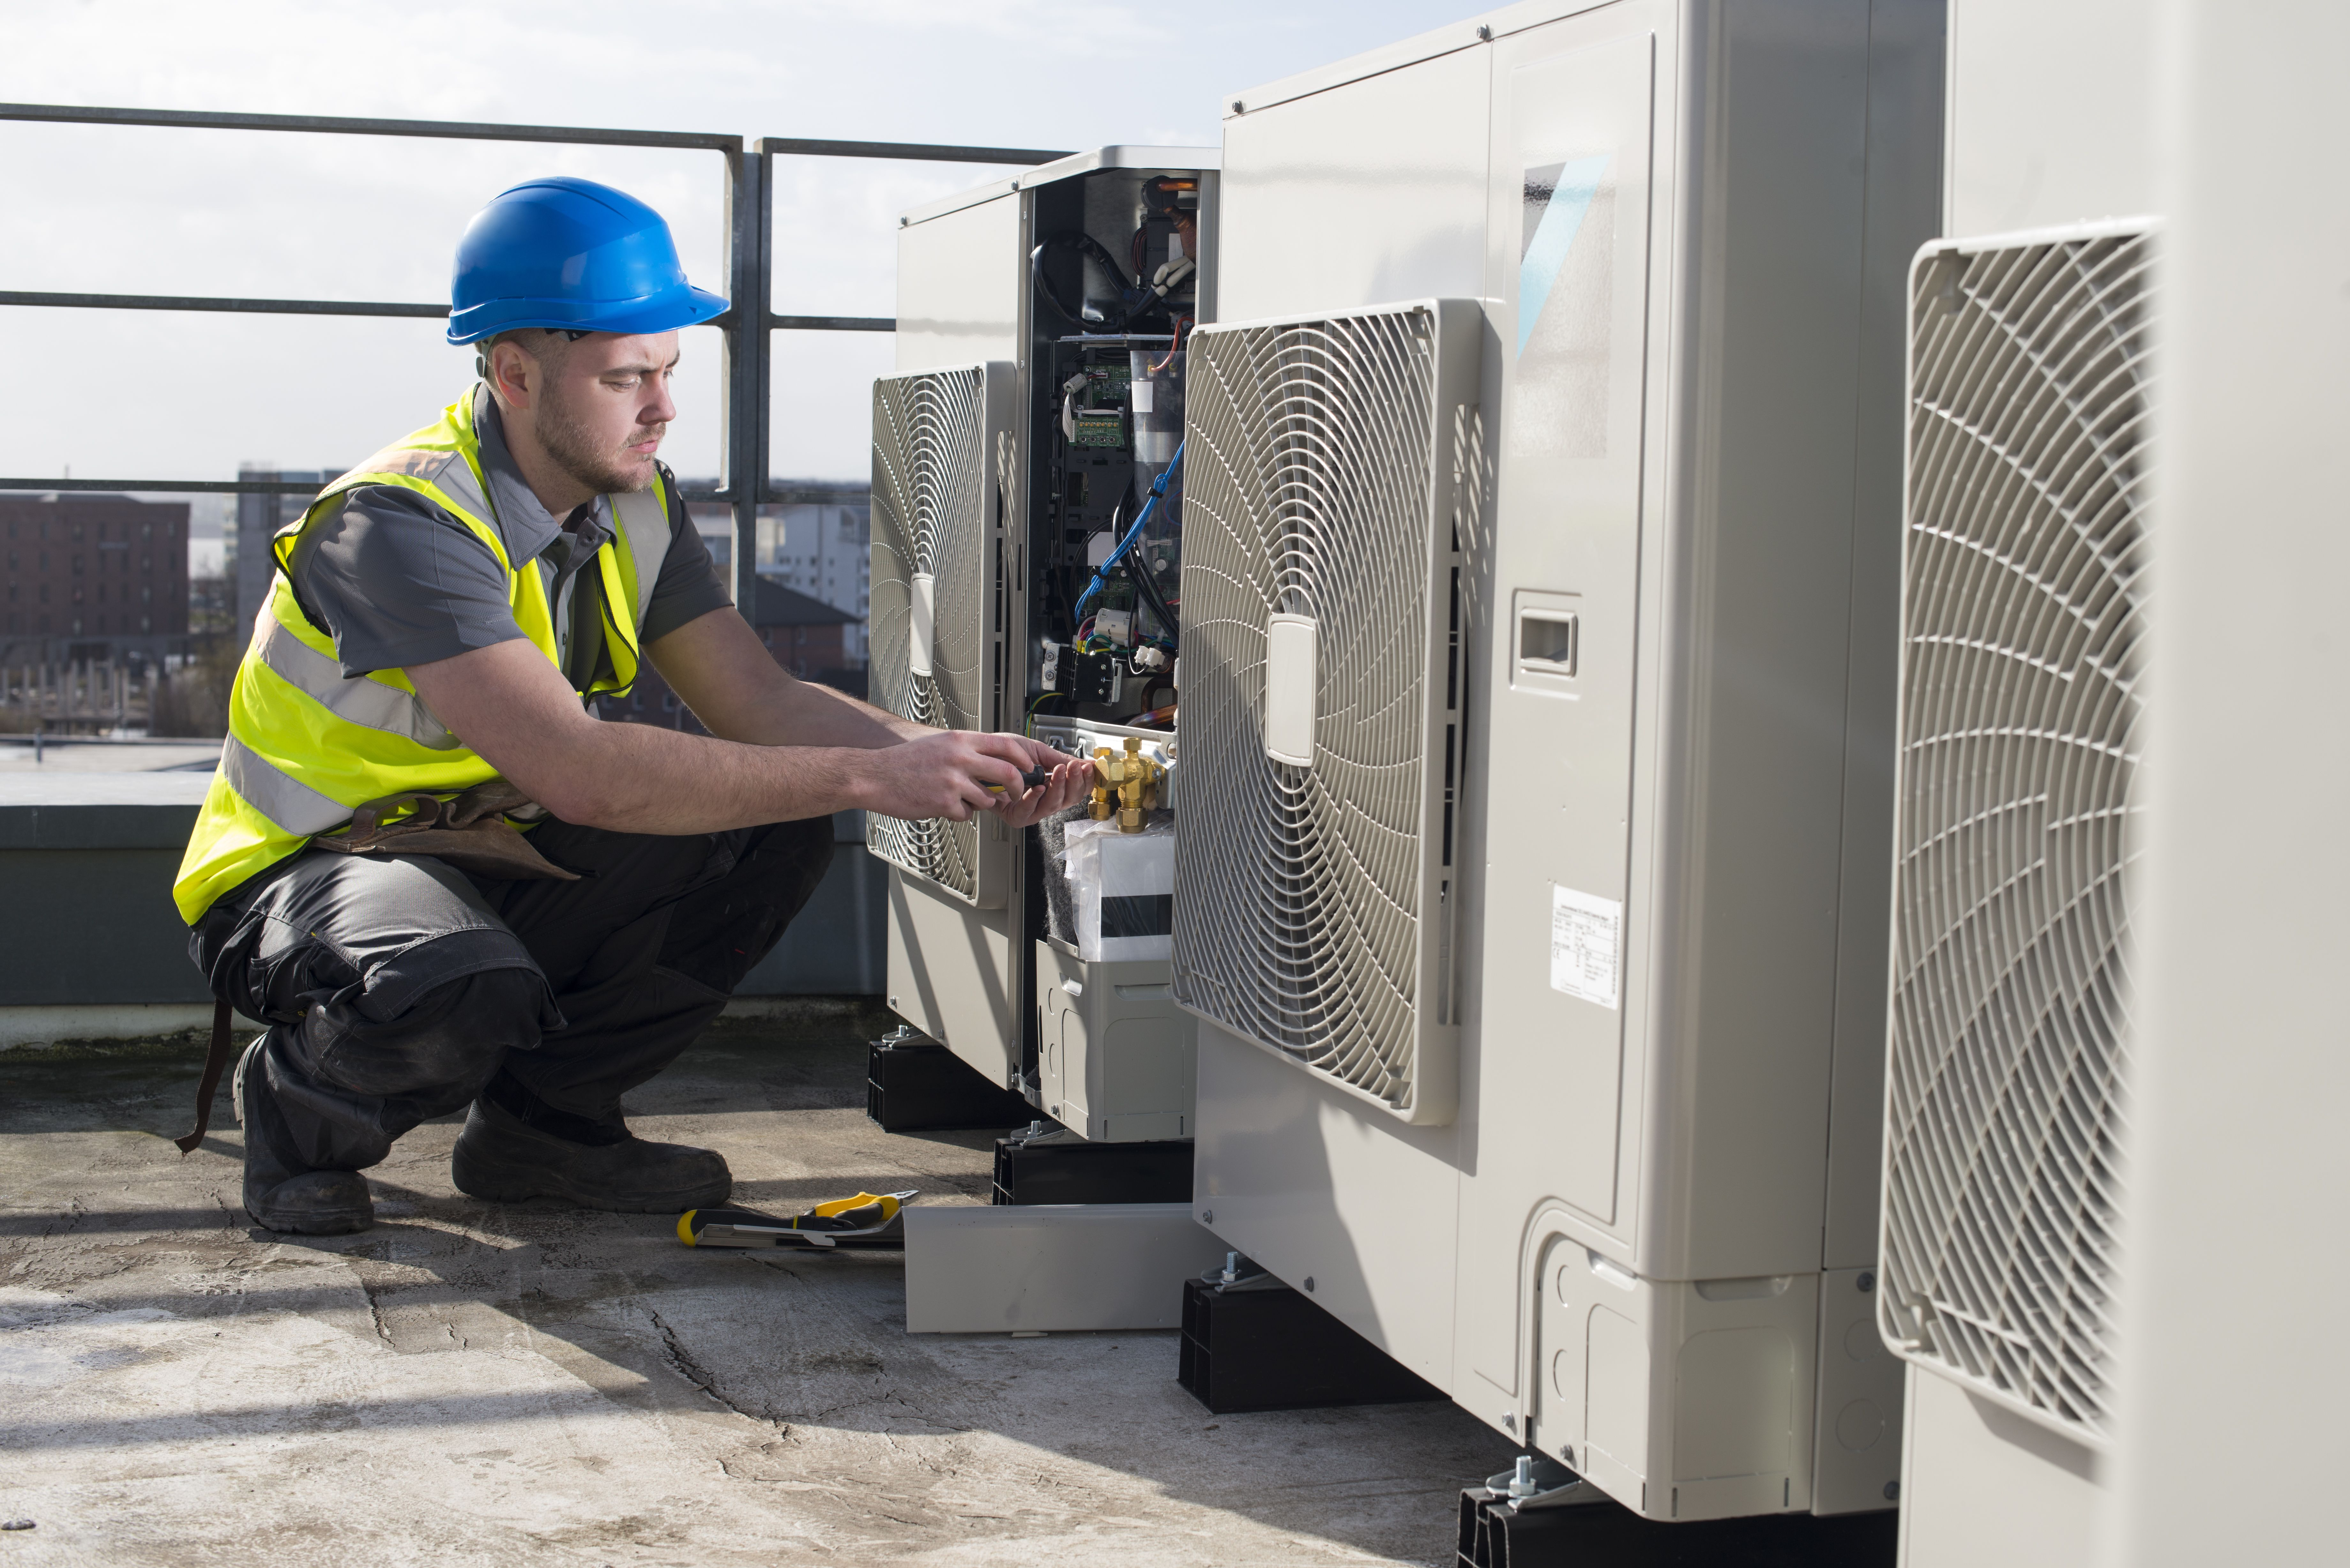 Servicing Air Conditioning Condenser